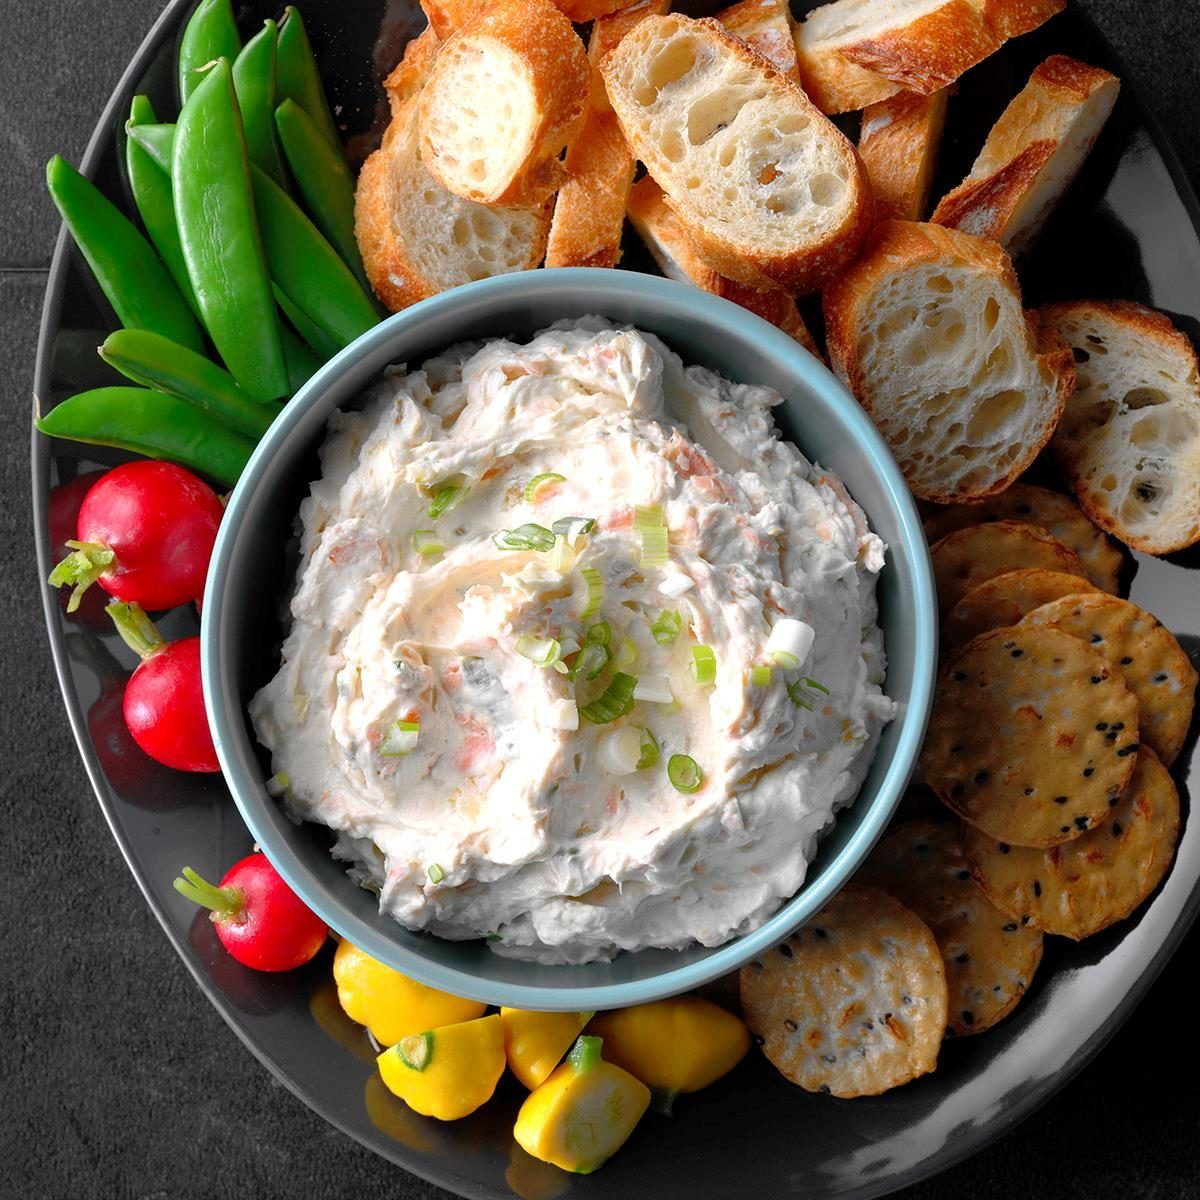 Simple Salmon Dip Recipe In 2020 Salmon Dip Salmon Dip Recipes Thanksgiving Appetizers Easy